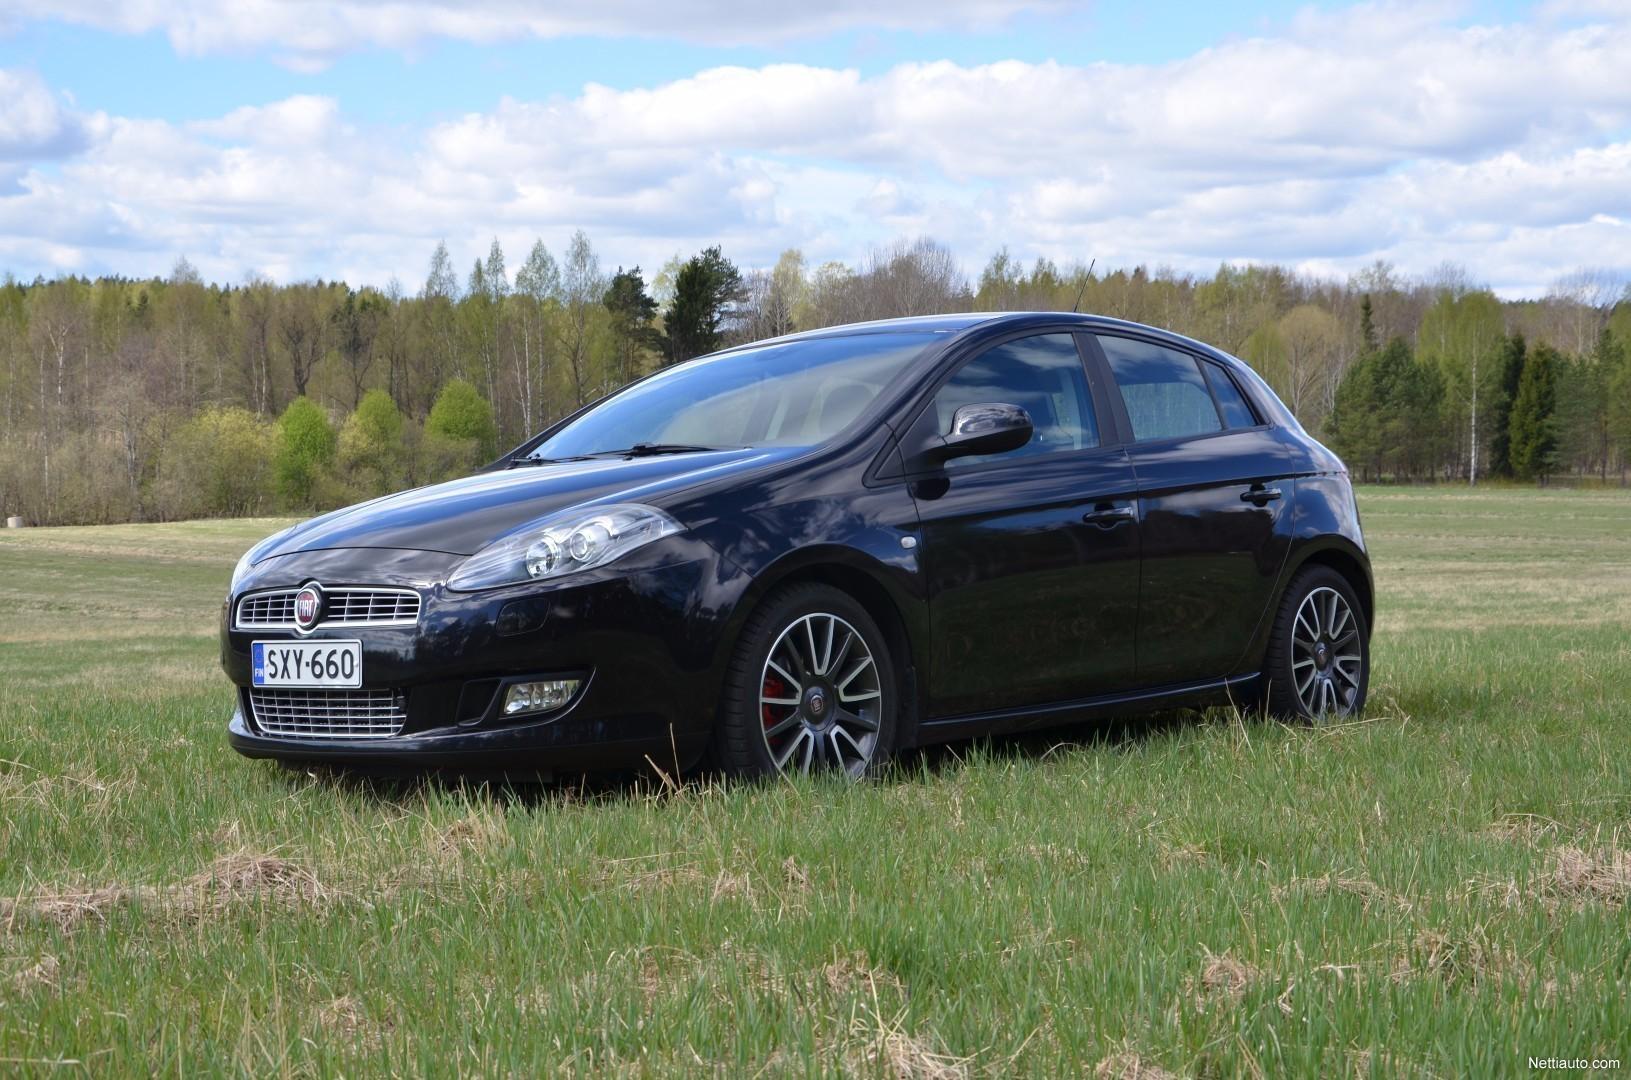 fiat bravo torino sport 1 4 t jet 150 hatchback 2011 used vehicle nettiauto. Black Bedroom Furniture Sets. Home Design Ideas